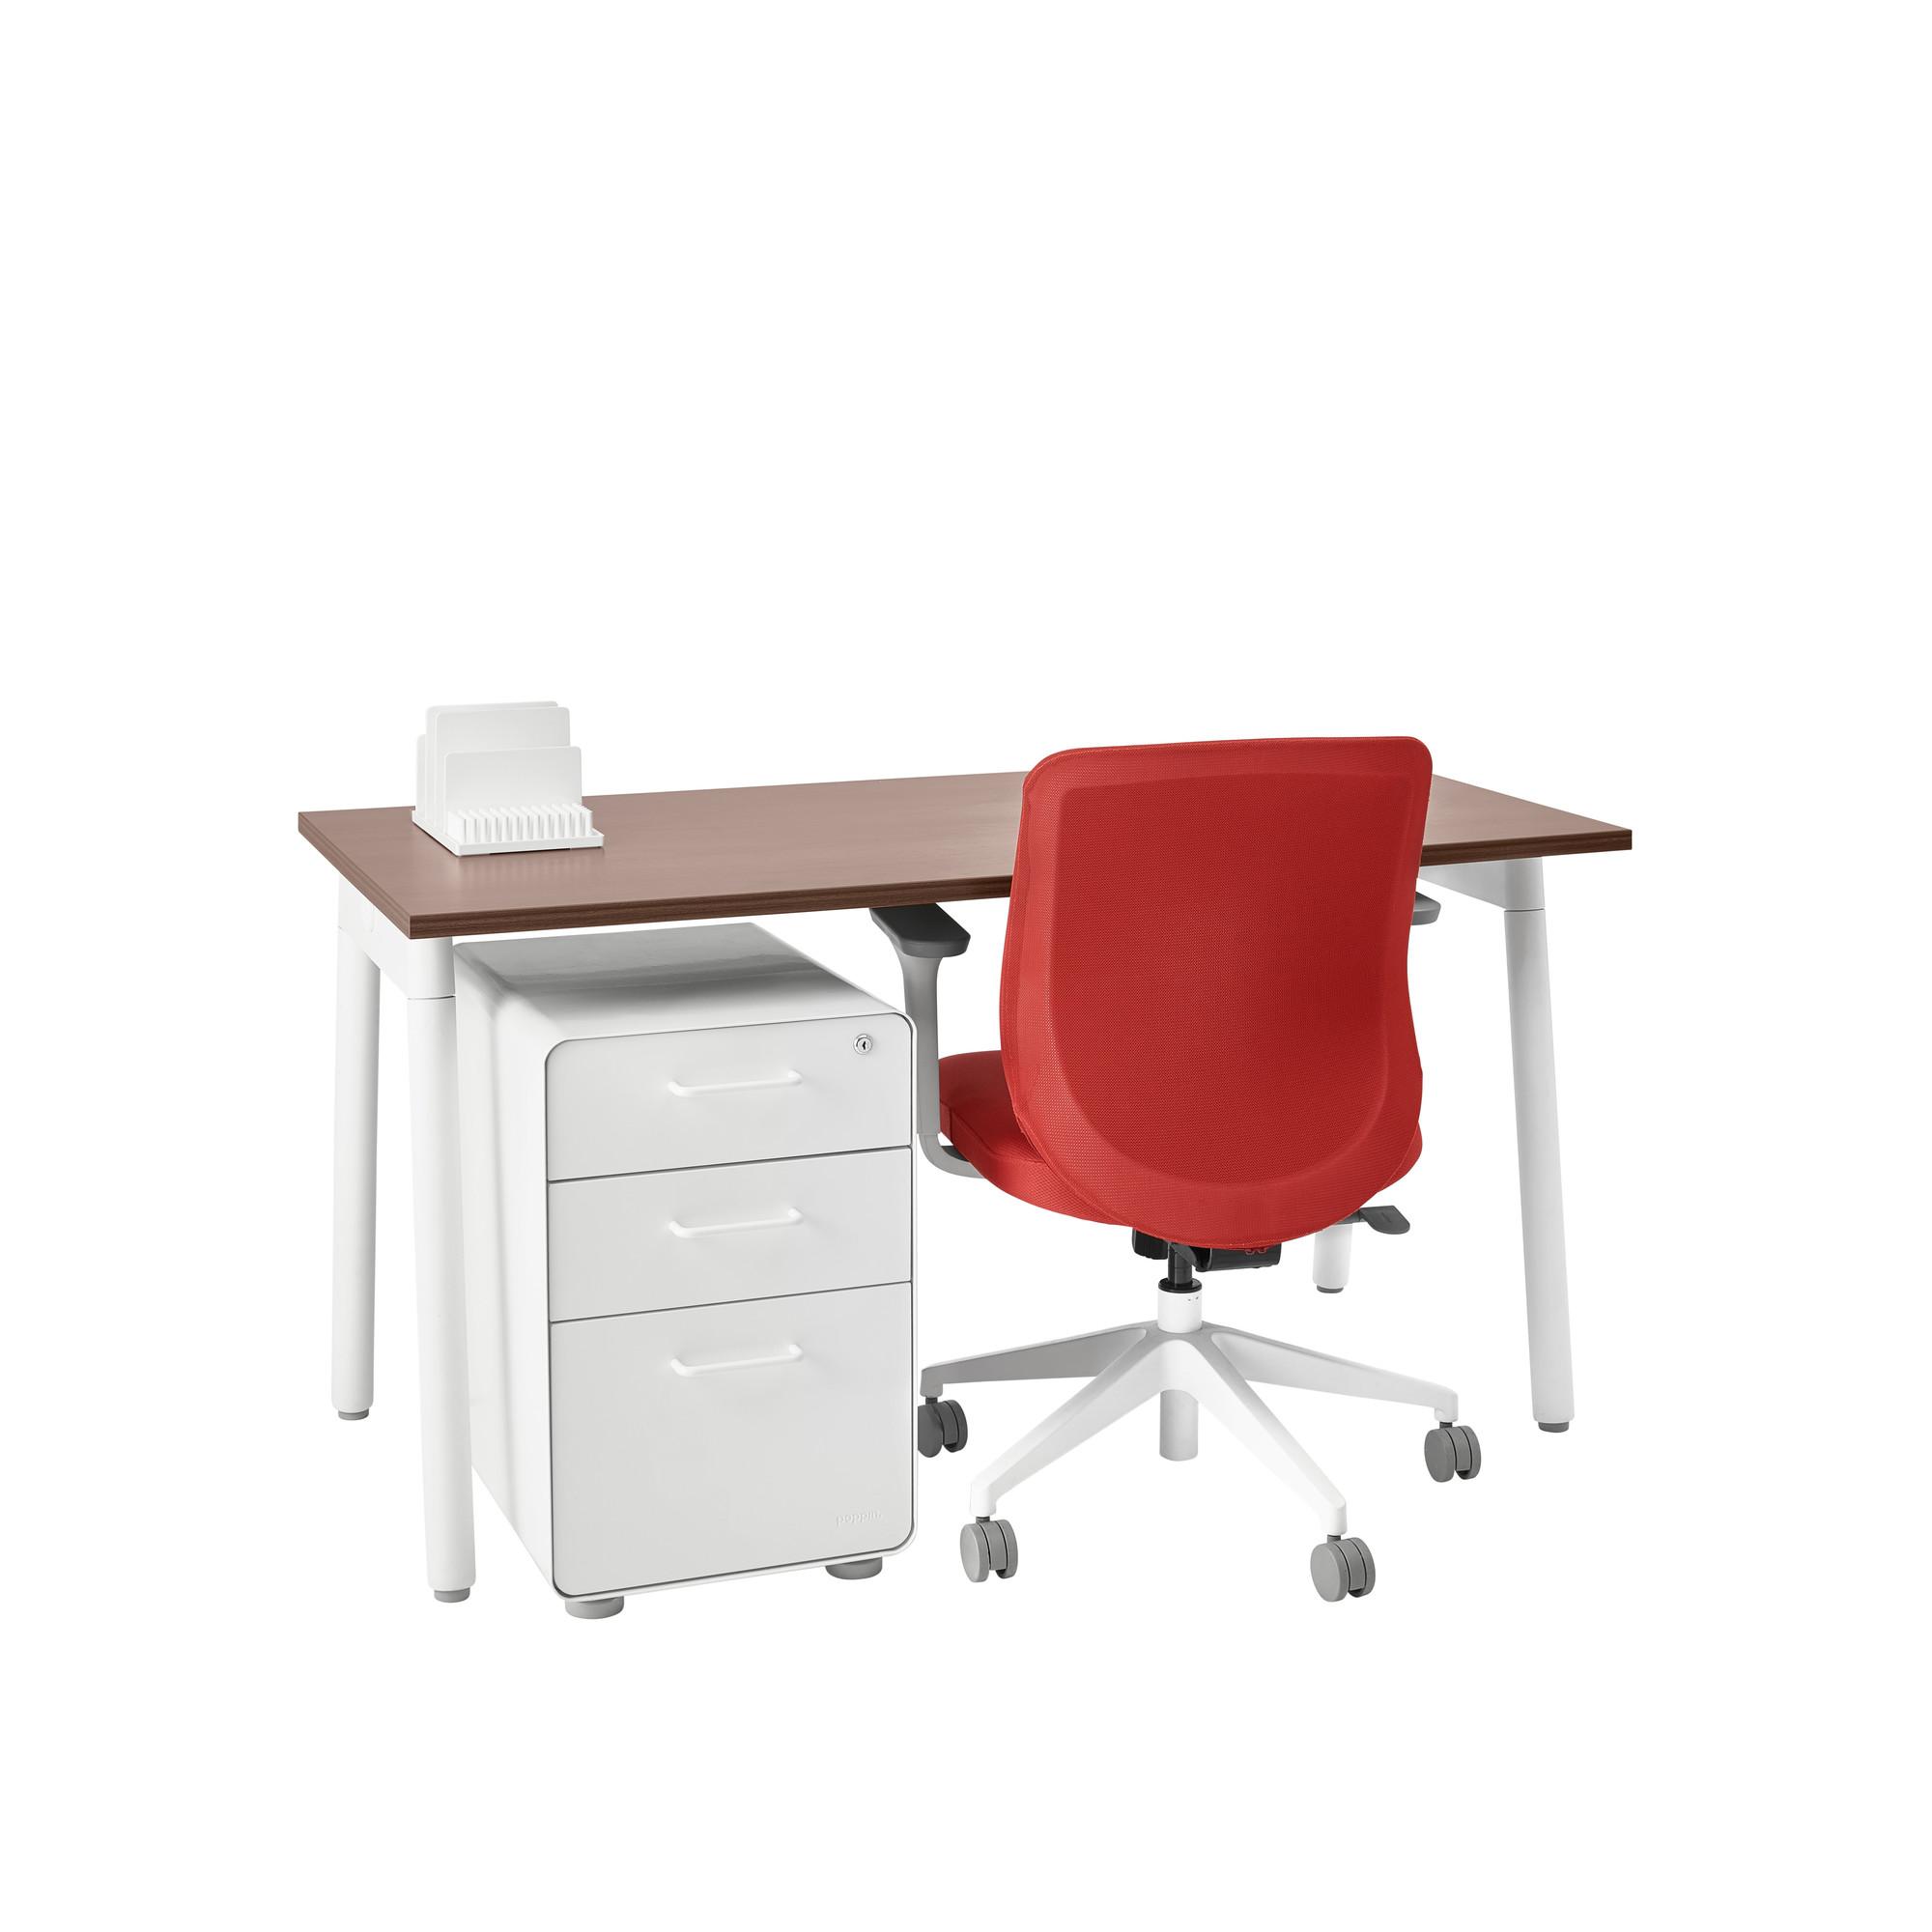 Walnut office furniture Desk Wire Management Series Single Desk For 1 Walnut 57 Neweggcom Series Single Desk For 1 57